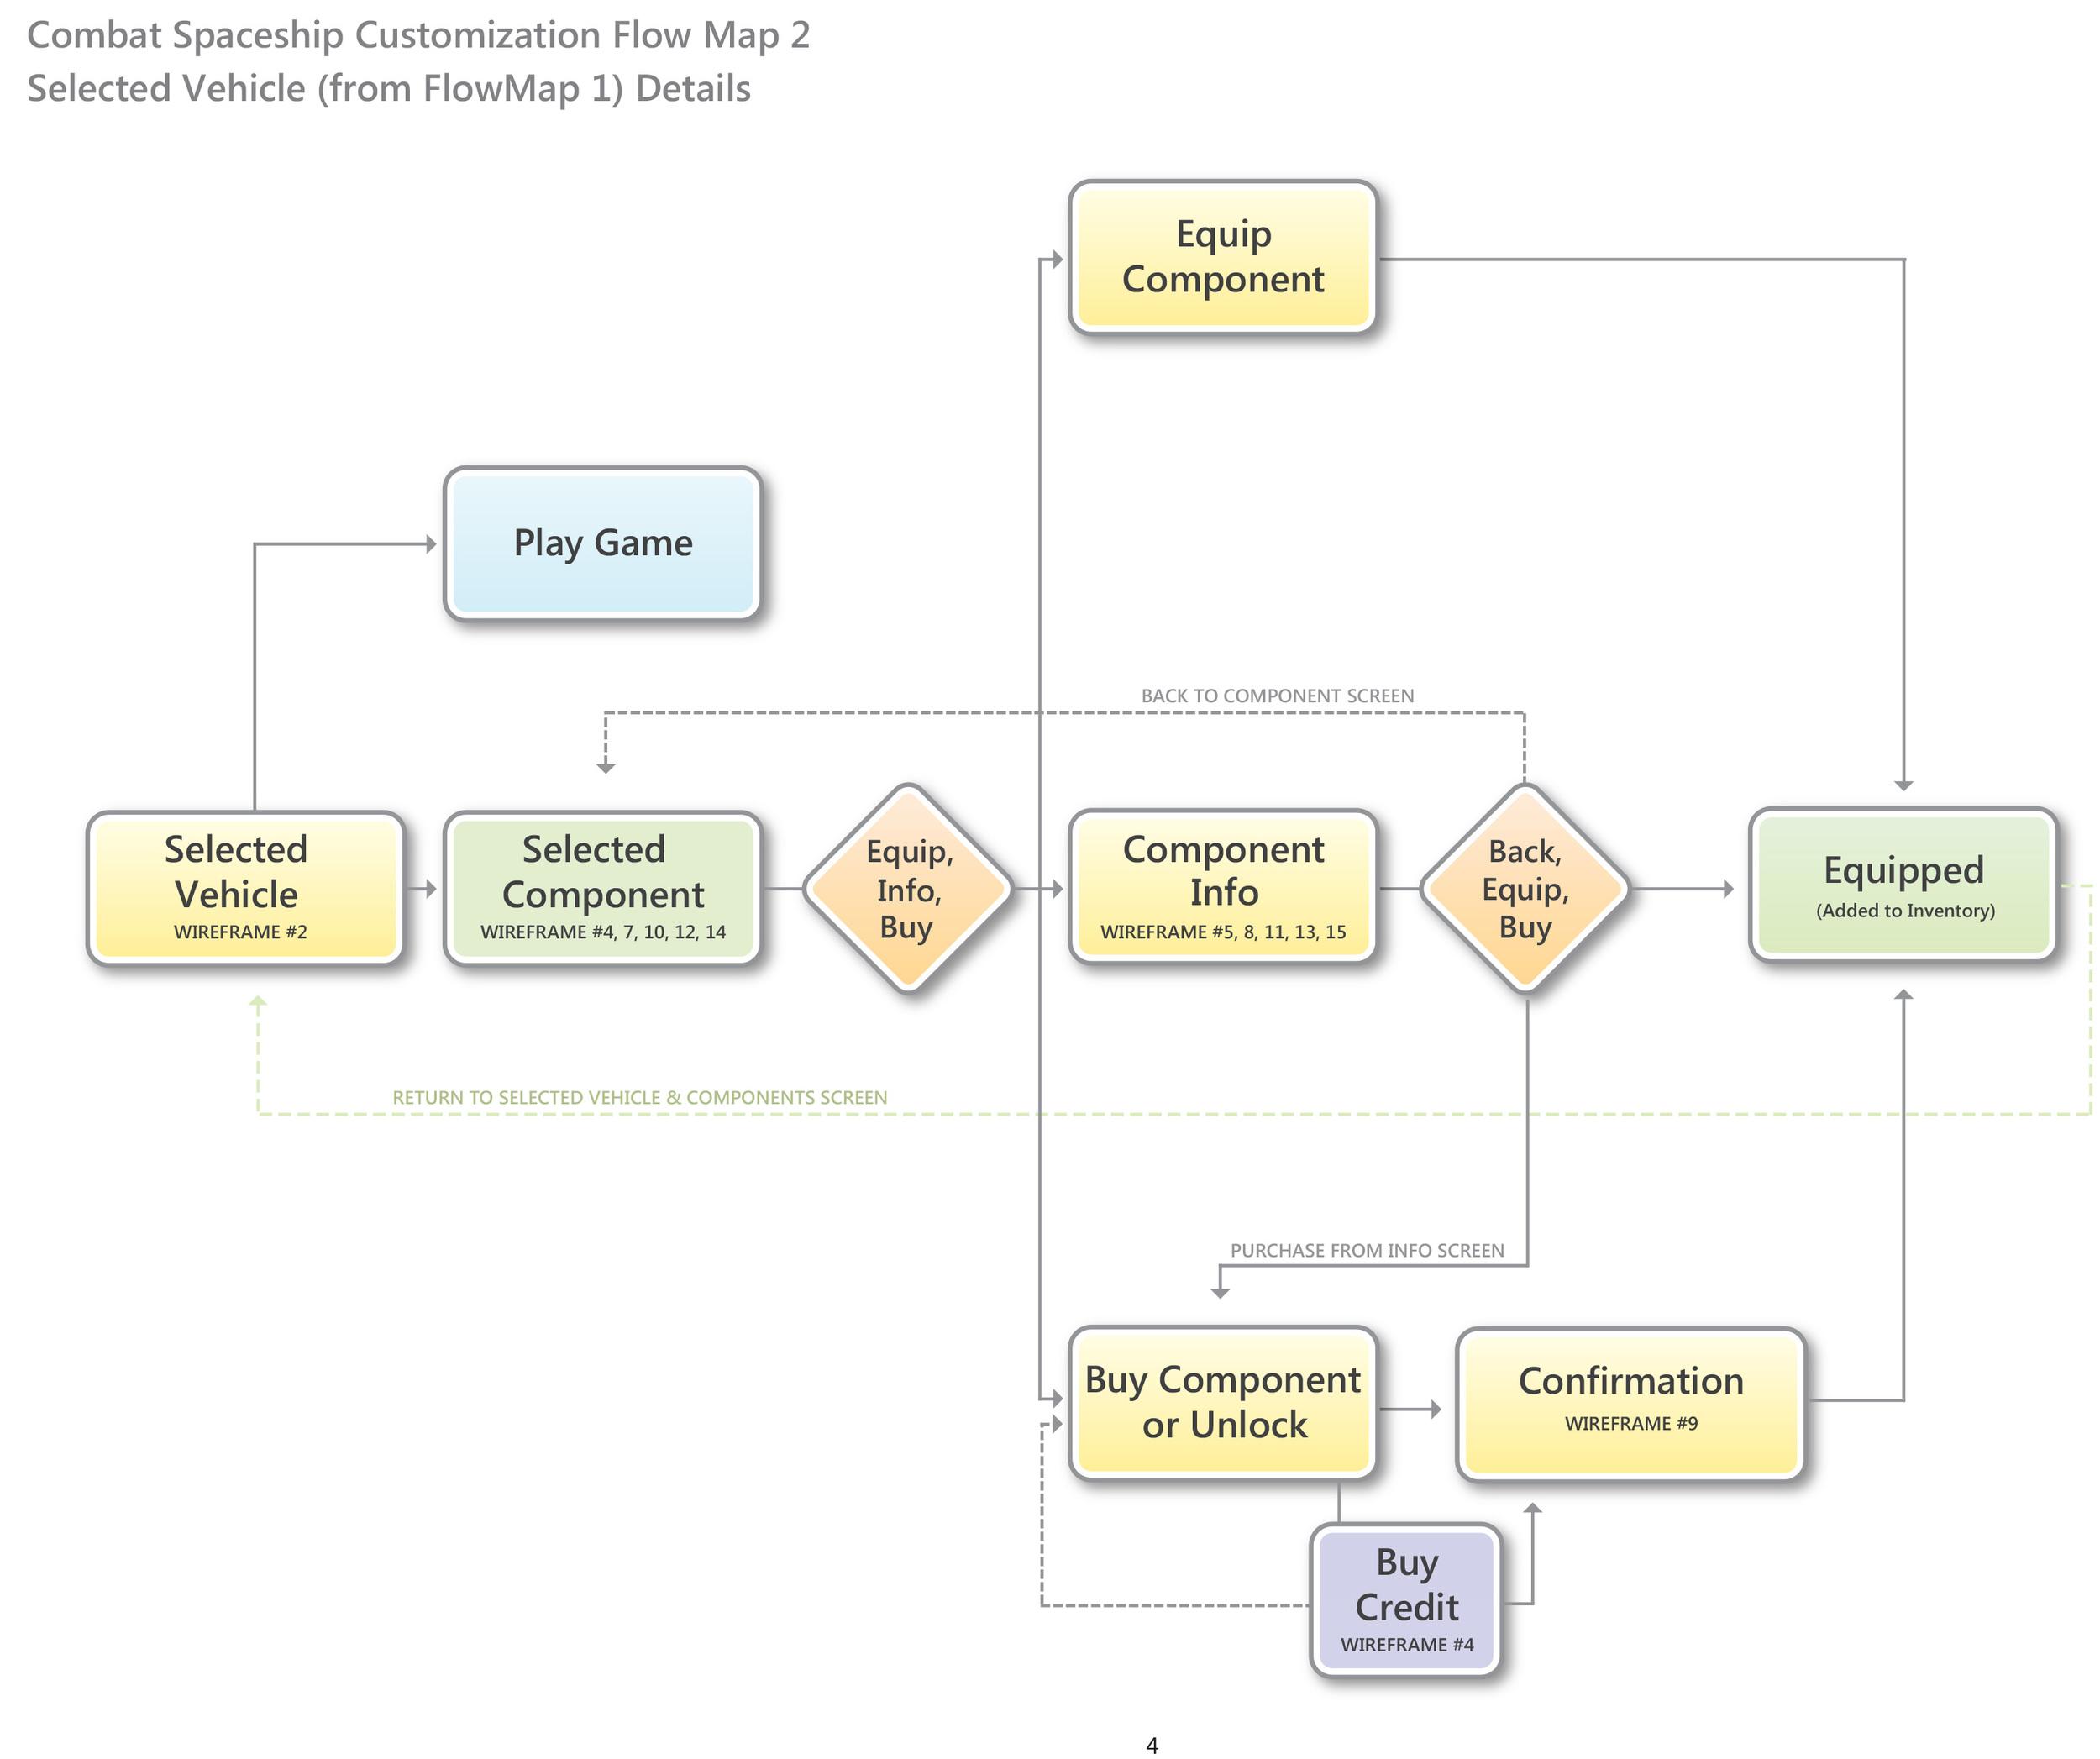 Flow Map 2